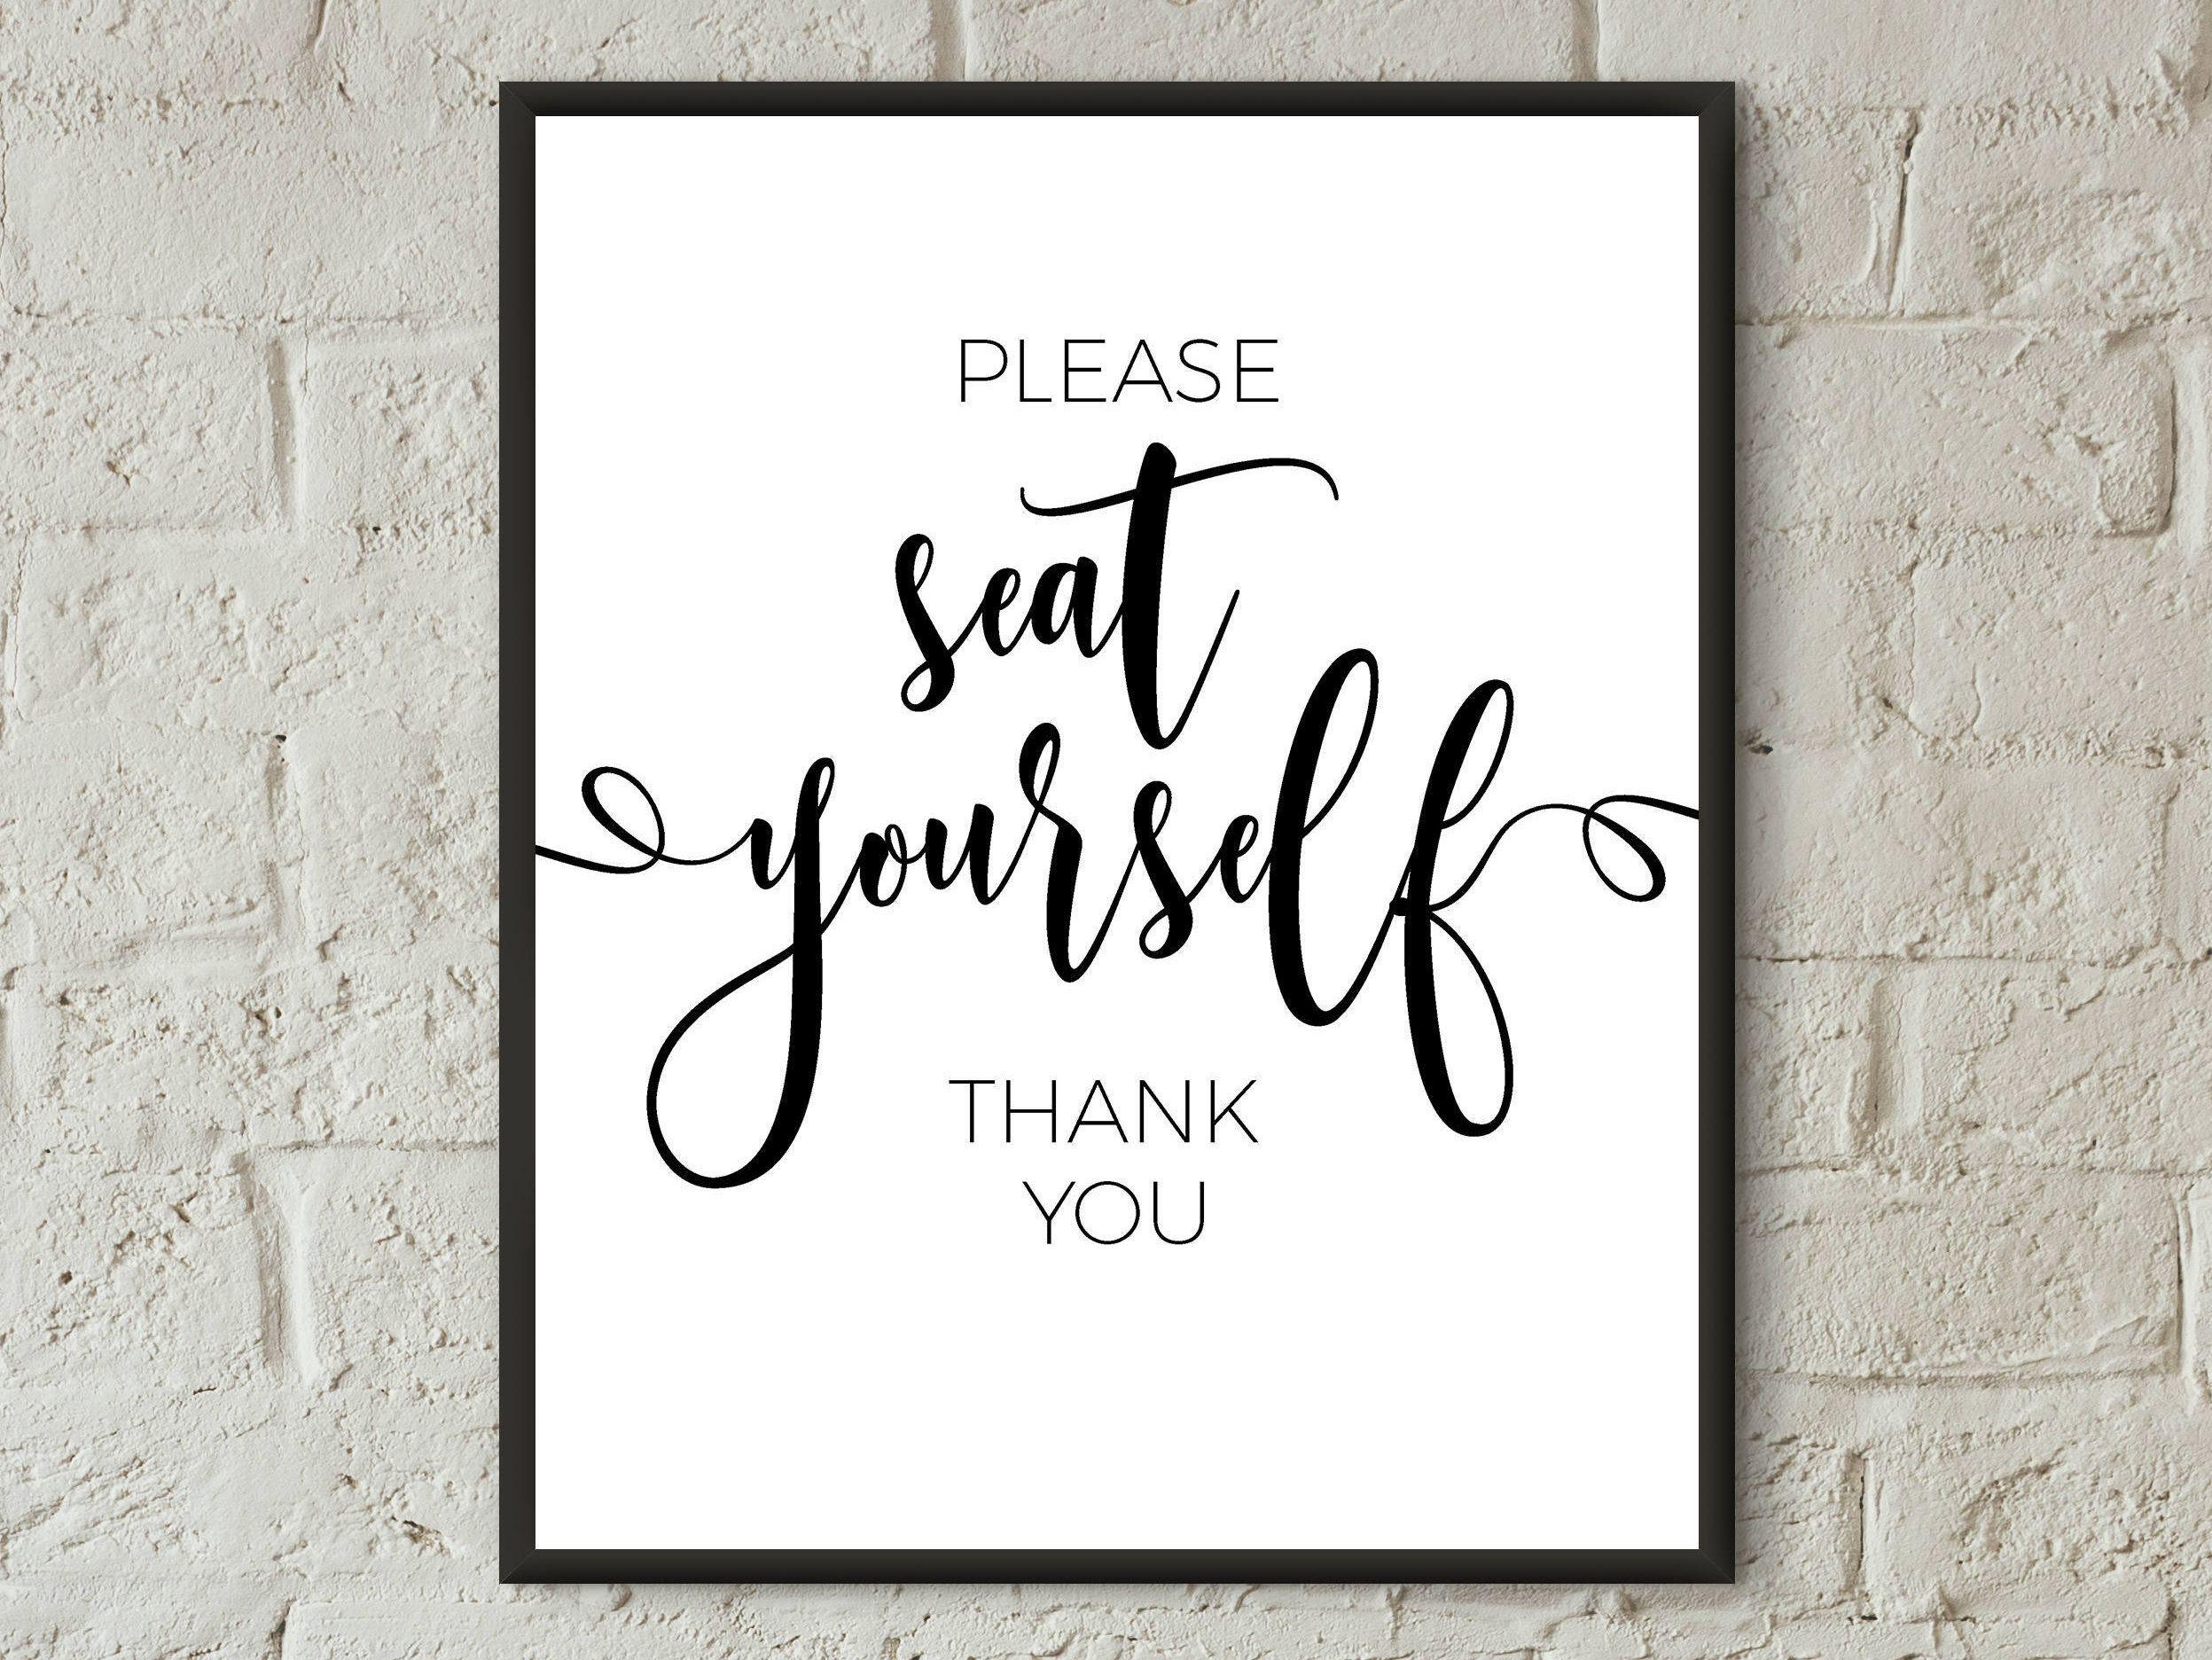 printable bathroom sign. Seat Yourself Bathroom Sign Printable Wall Art Please Funny Quotes Decor Washroom